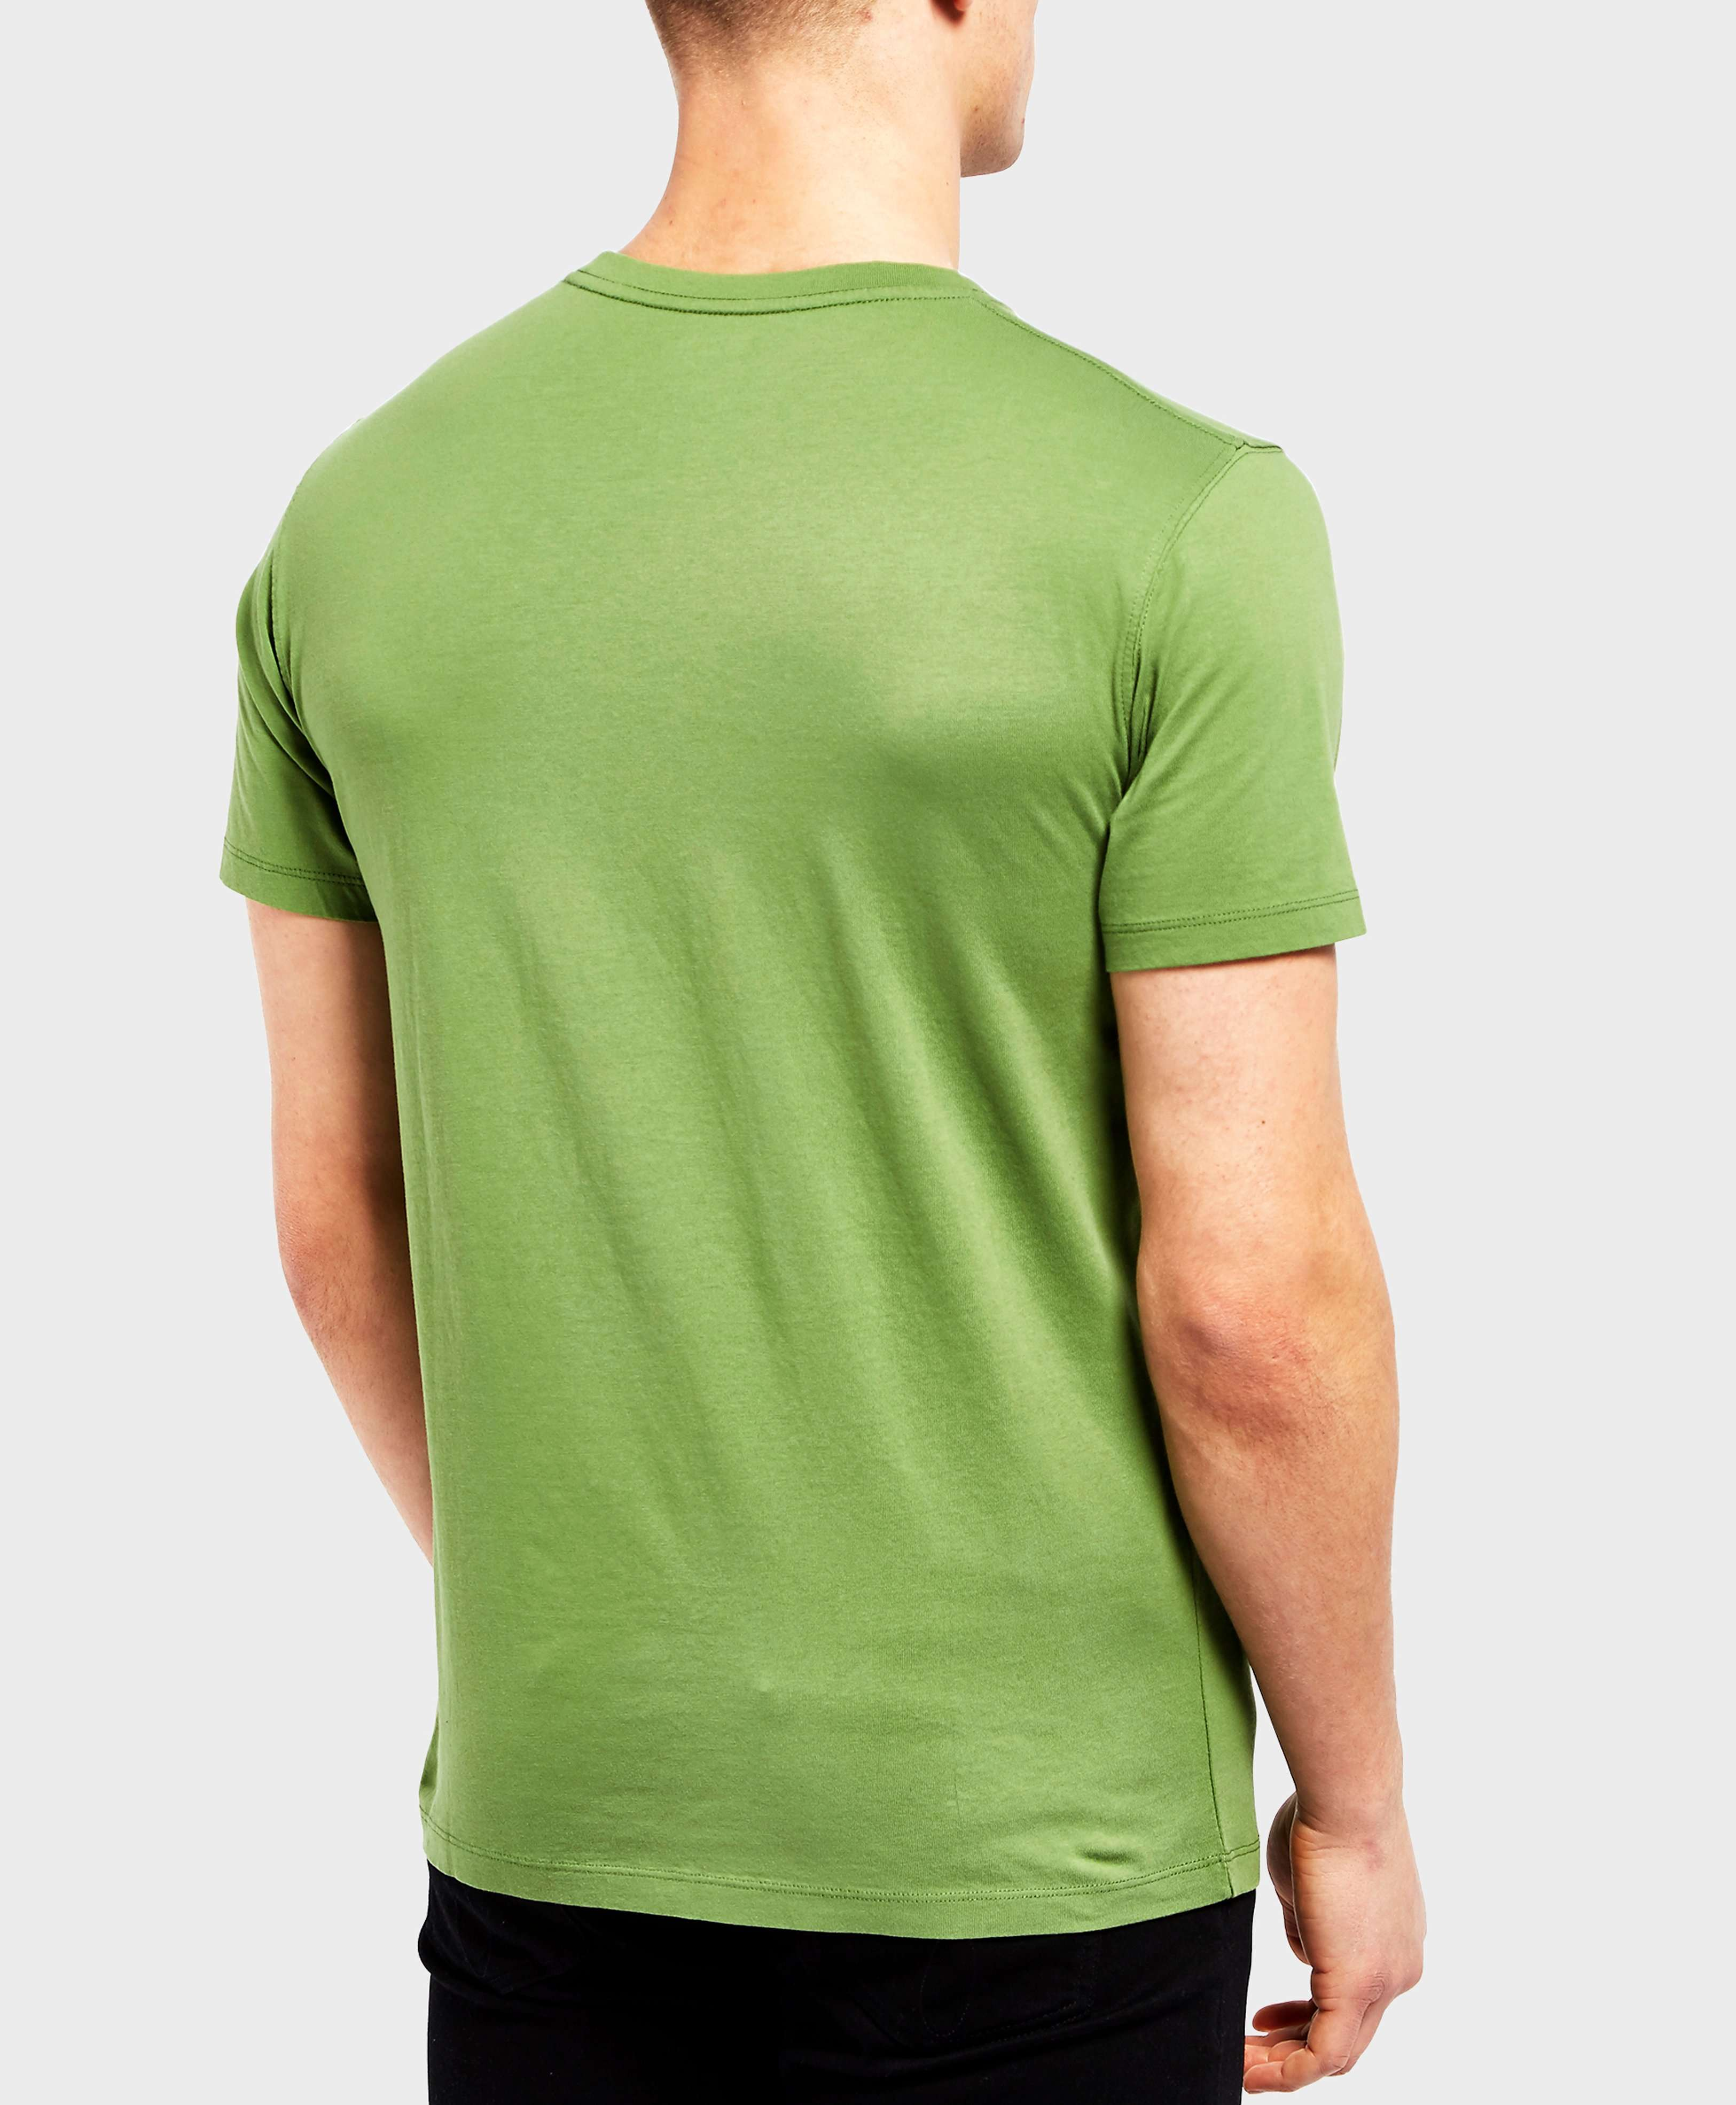 Fjallraven Trekking Short Sleeve T-Shirt